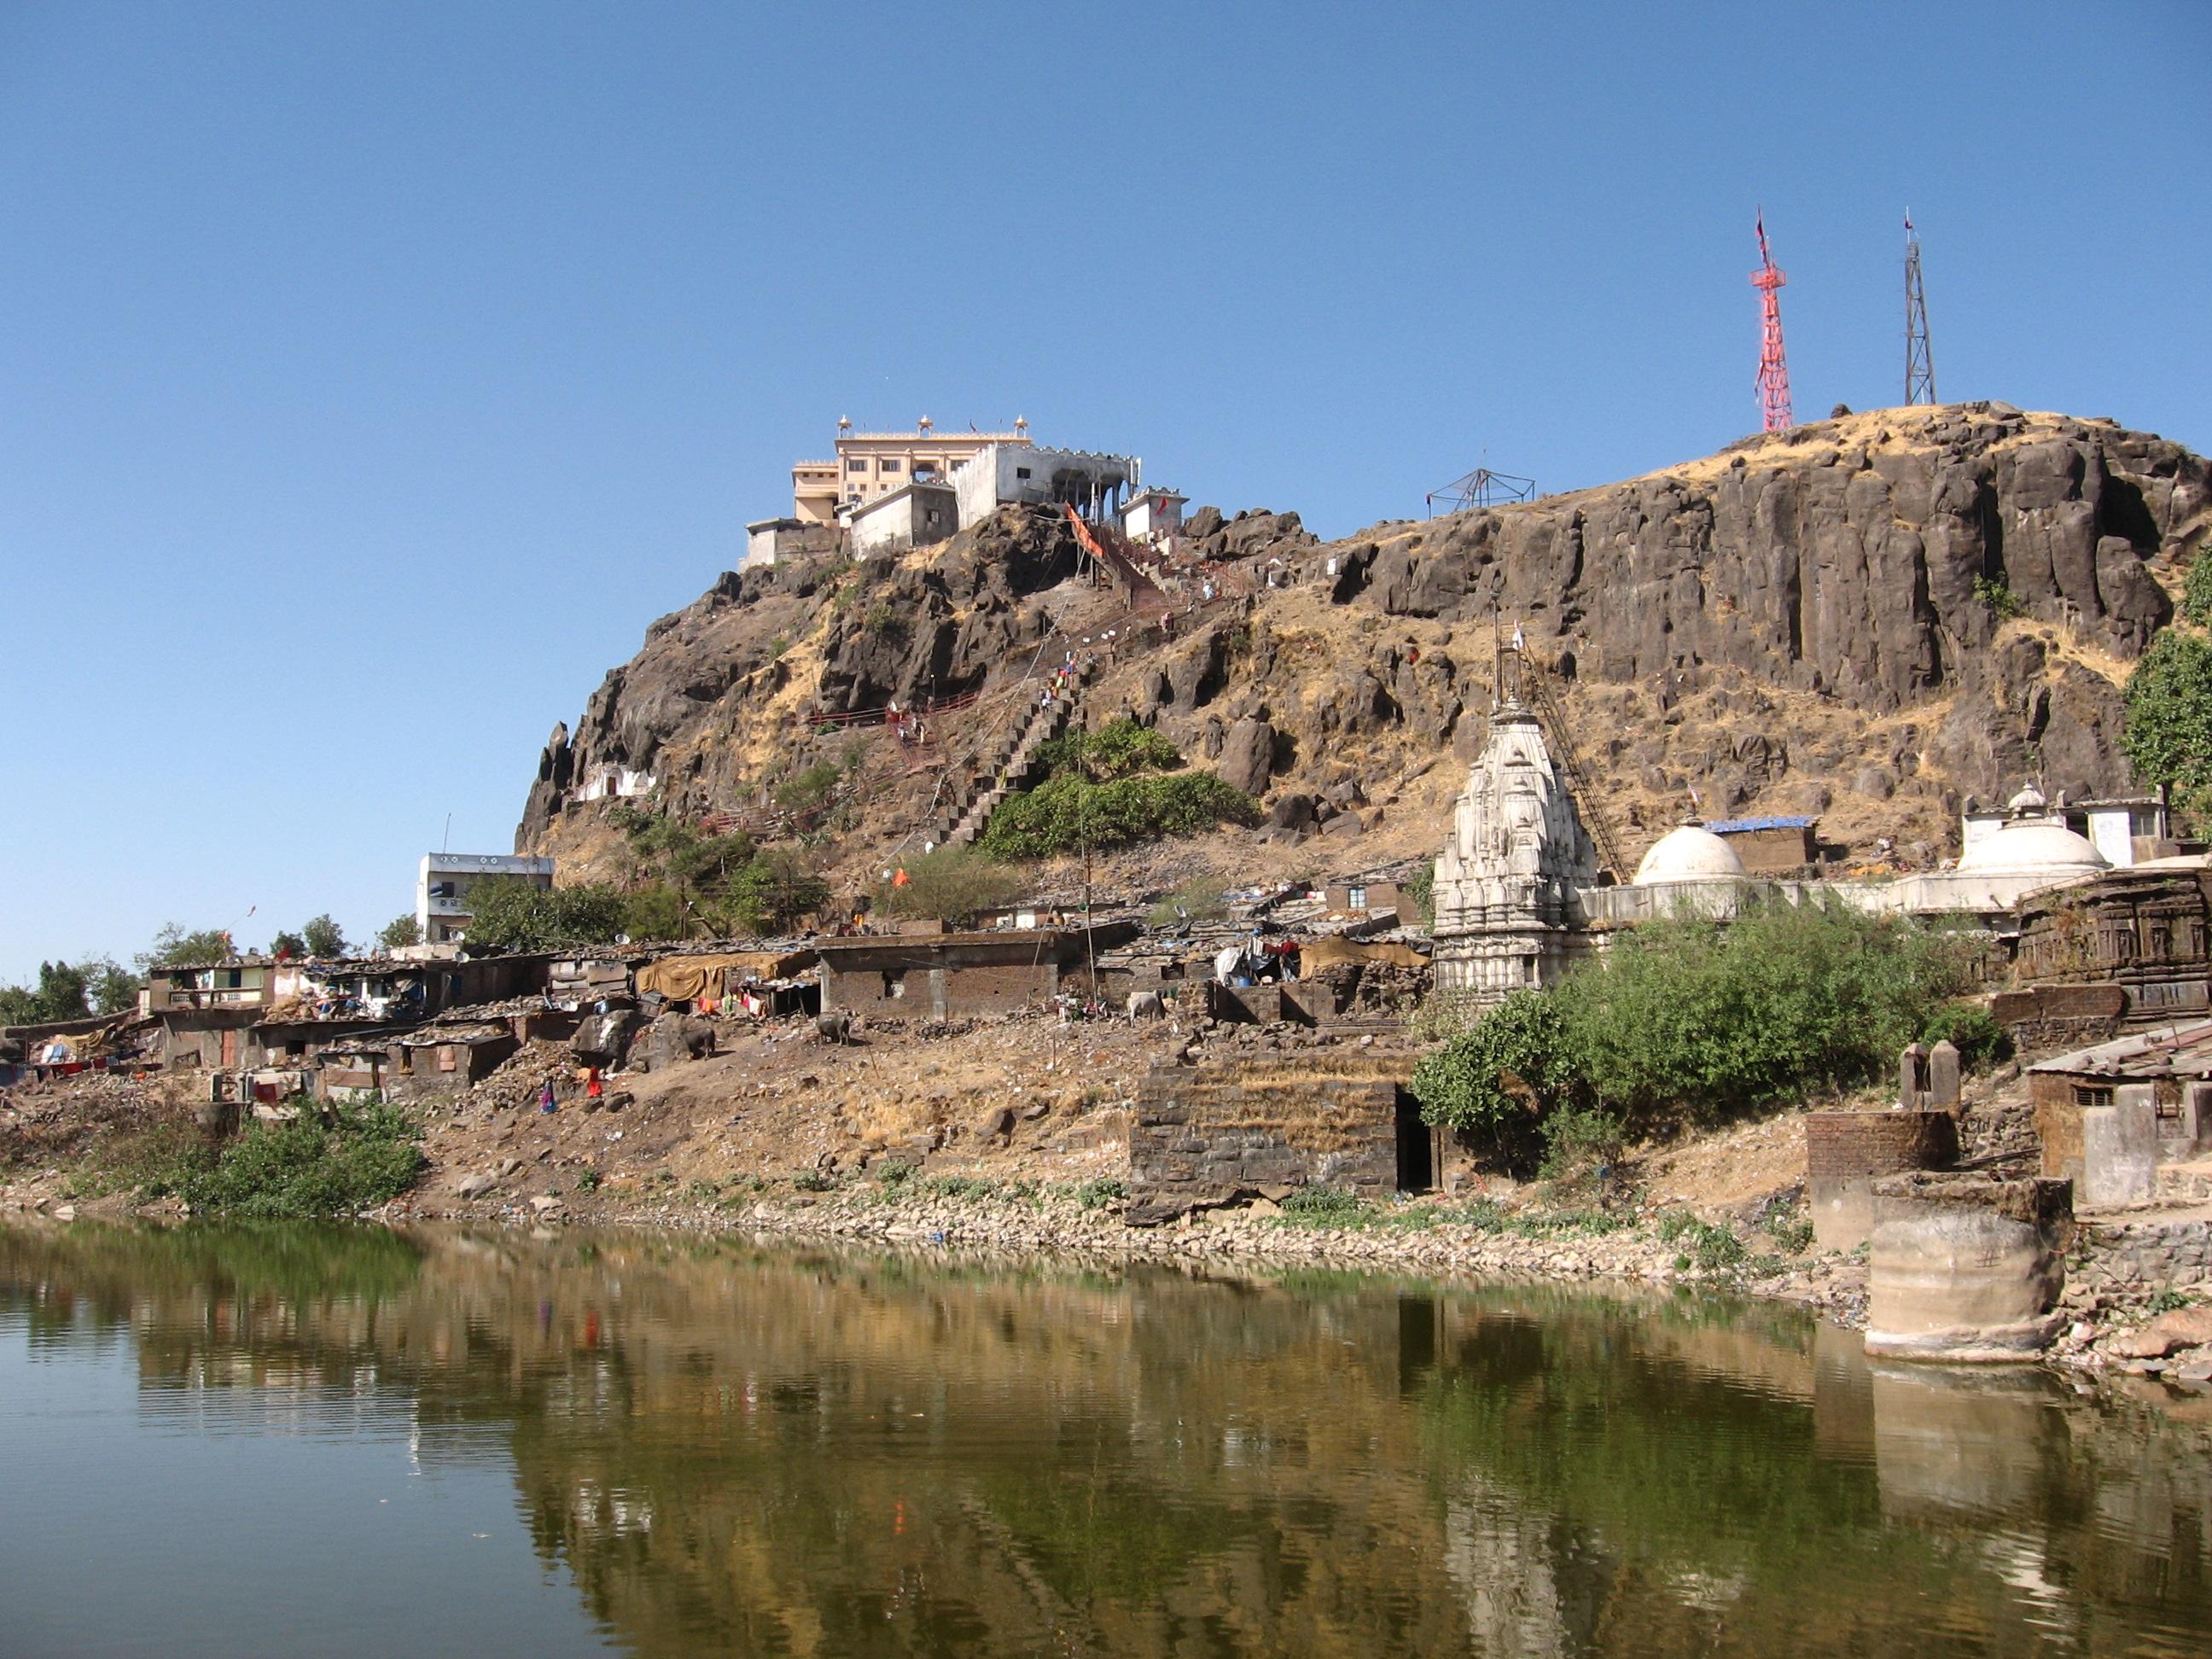 PunjabKesari, Punjab Kesari, Dharam, Jhabua, झाबुआ की स्वयंभू माता मंदिर, Swayambhu Mata Temple of Jhabua, अंचल छोटी पावागढ़, Anchal Chhoti Pavagadh, Dharmik Sthal, Religious Place in india